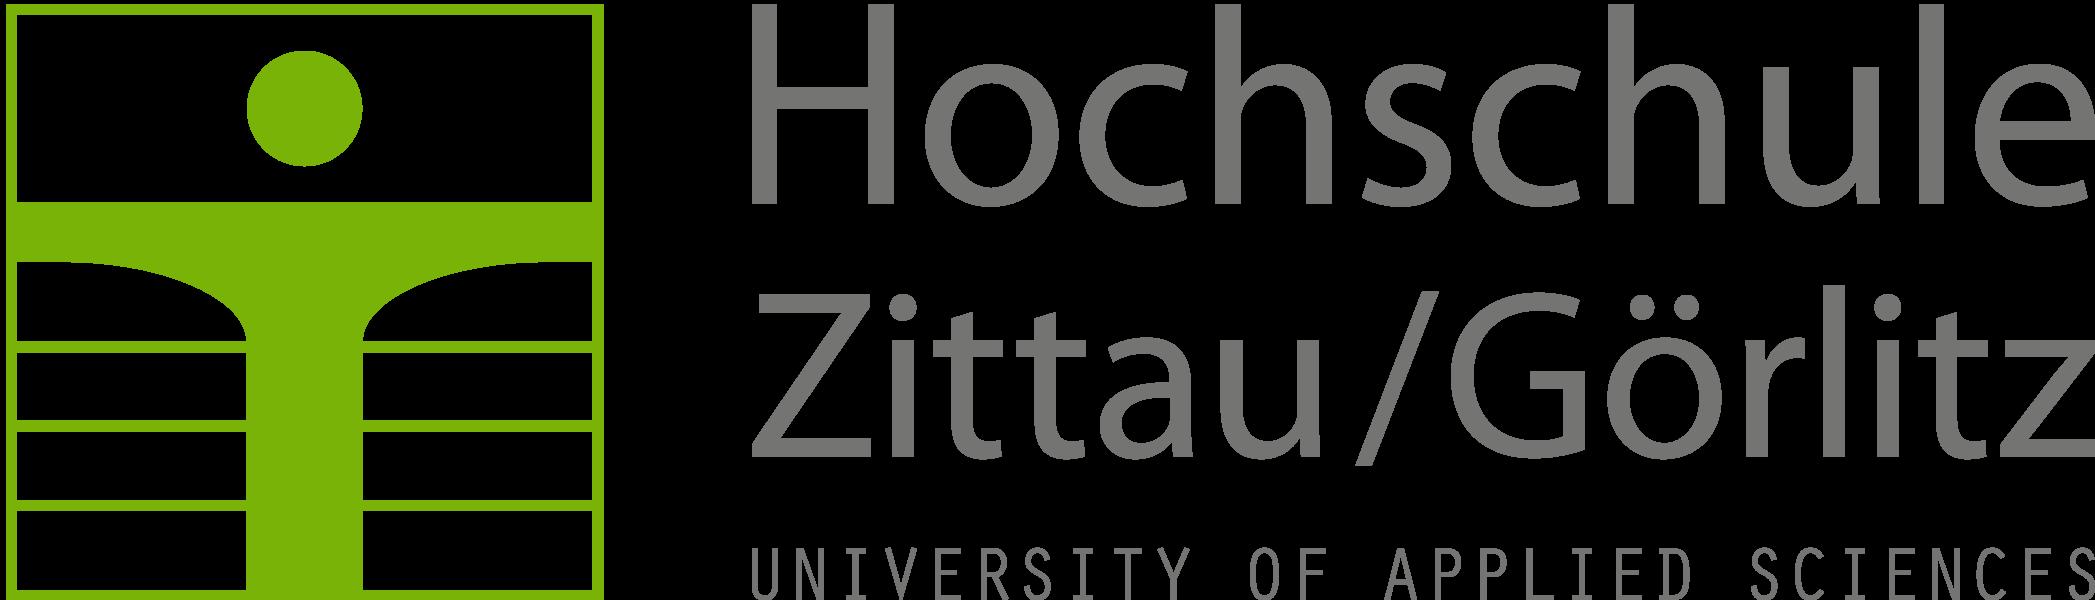 Hochschule Zittau Görlitz